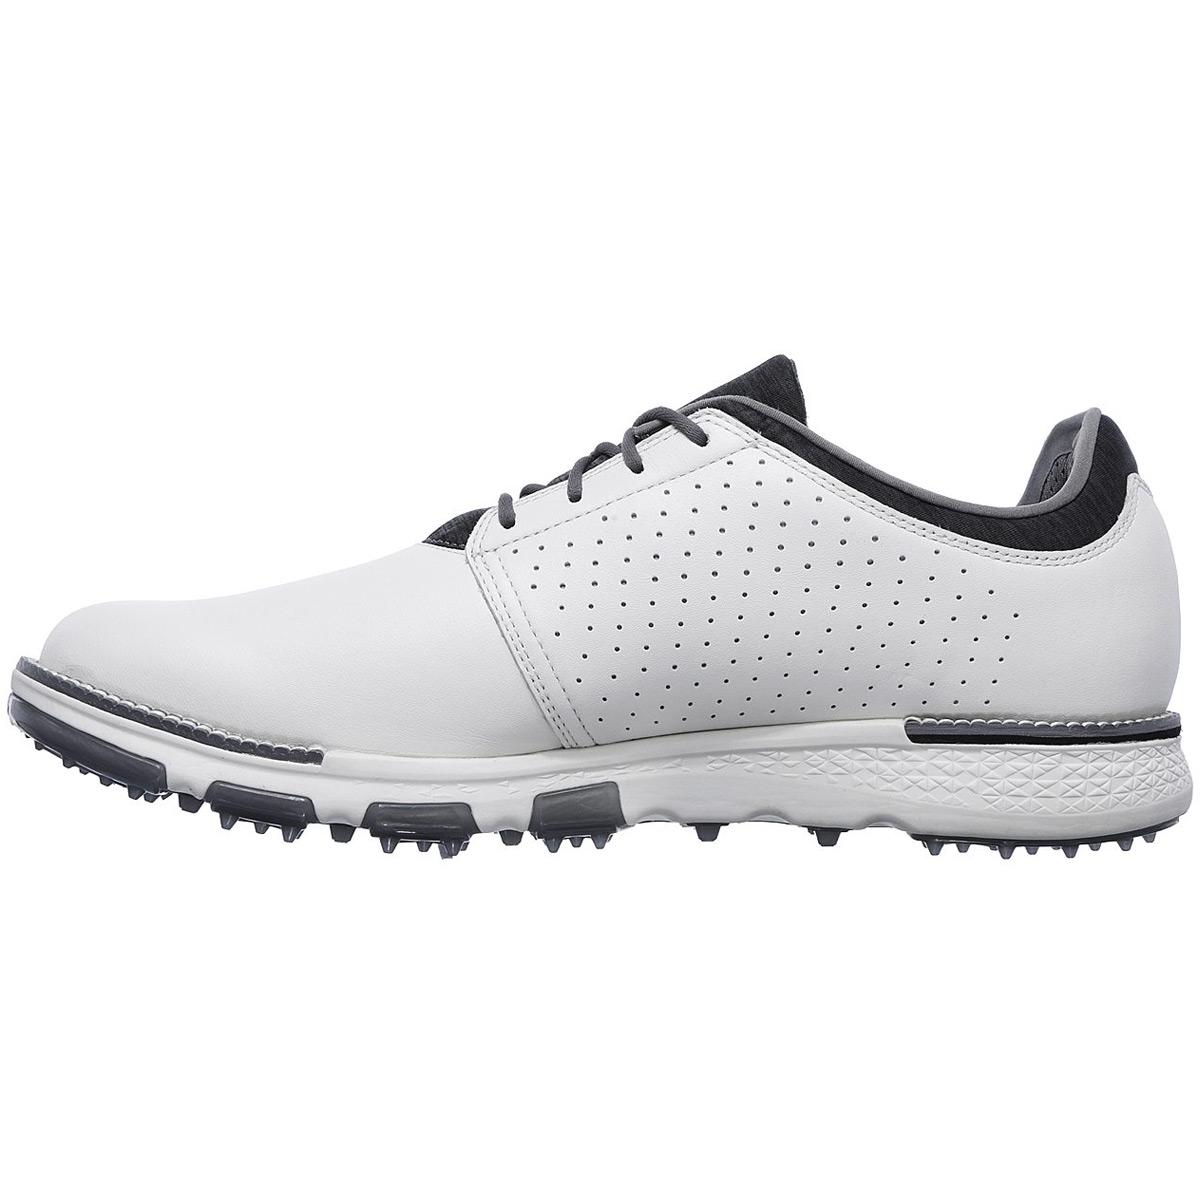 Skechers-Golf-Mens-2019-Go-Elite-V-3-Spikeless-Waterproof-Leather-Golf-Shoes thumbnail 6